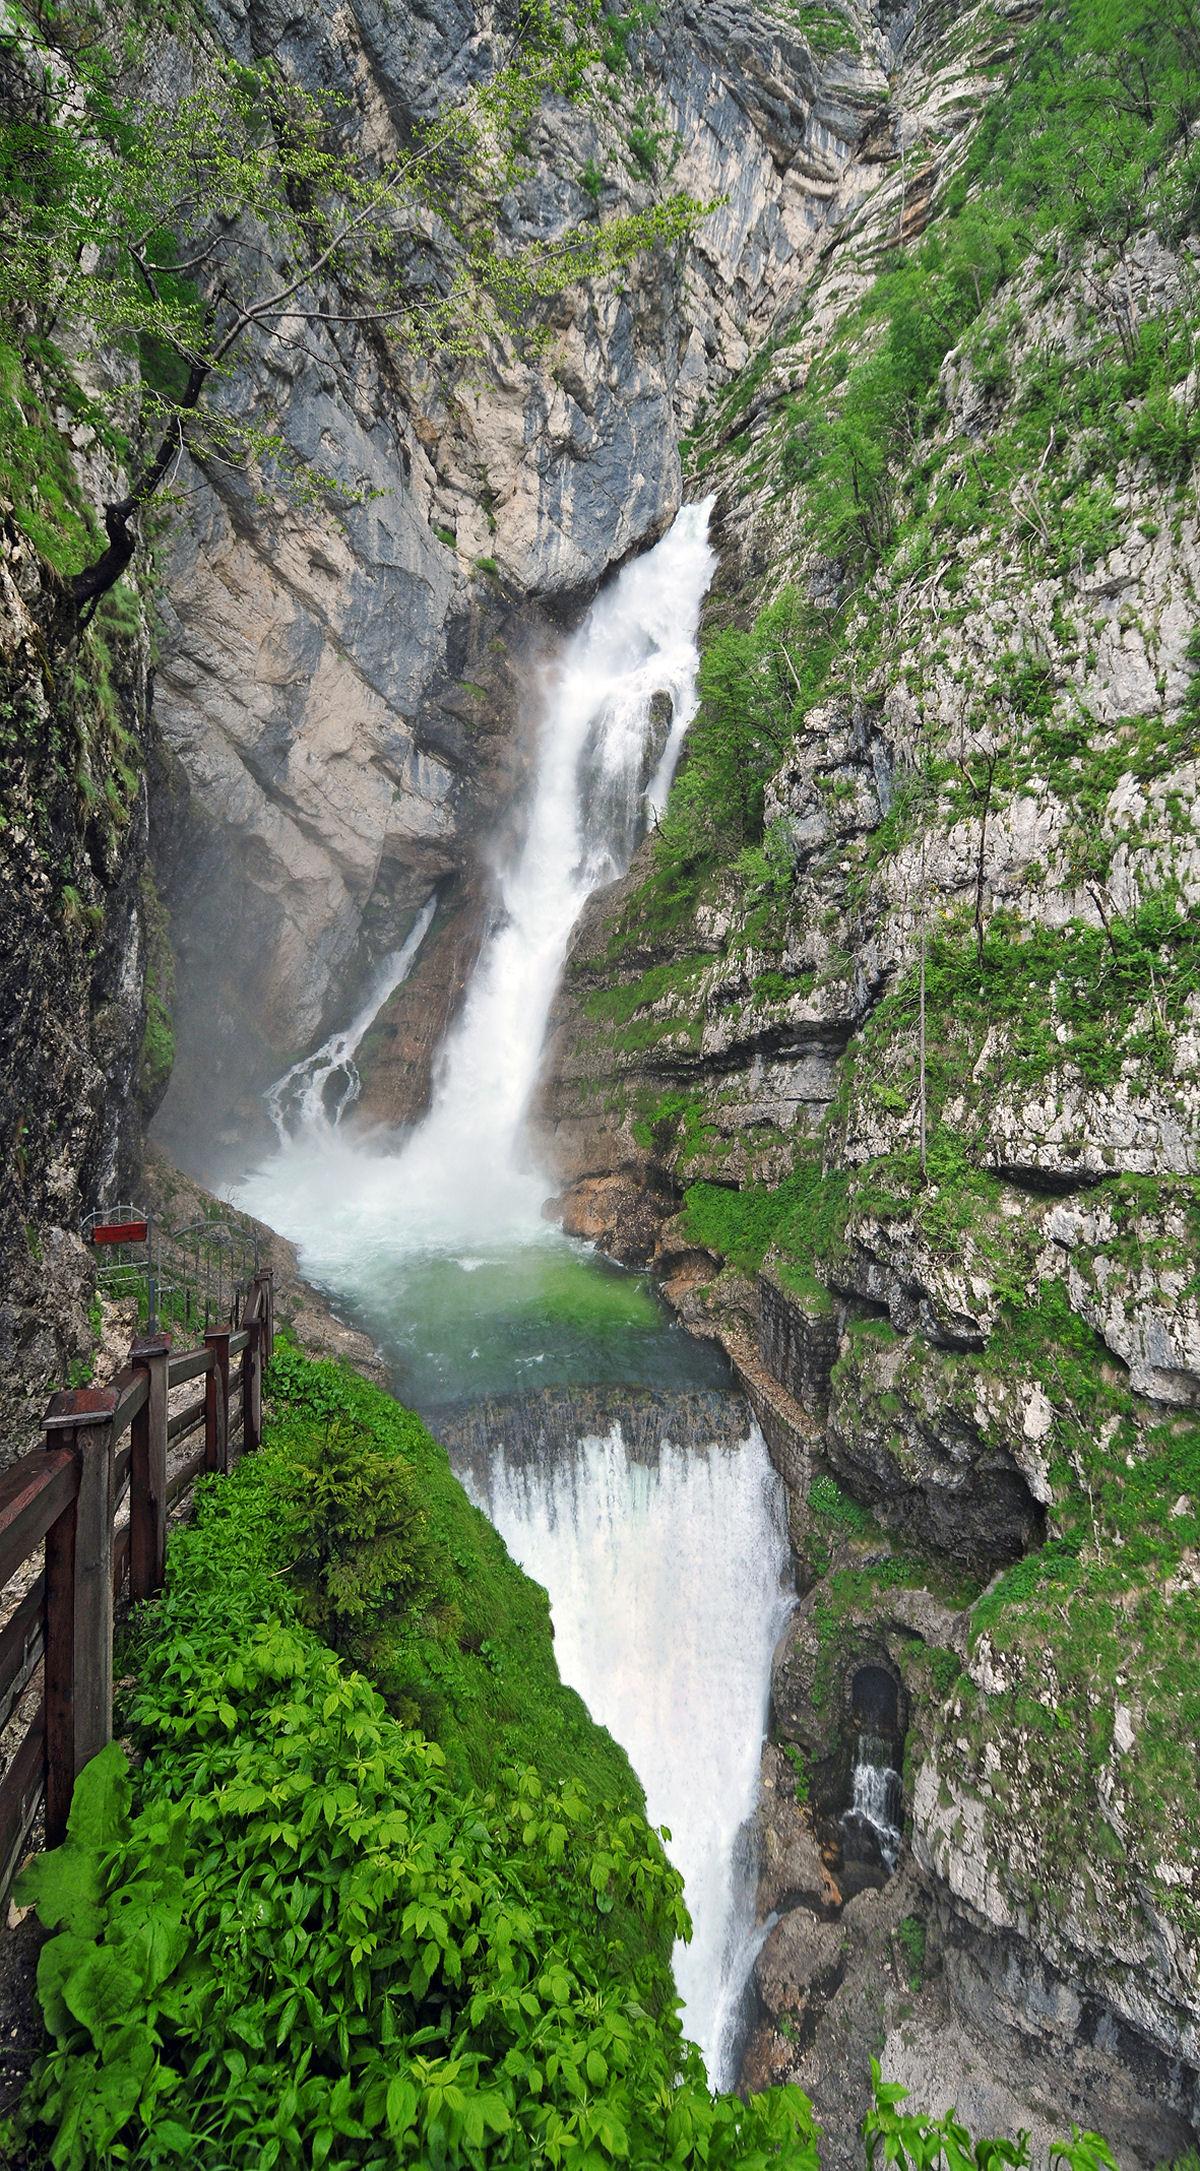 Waterfall Savica in the Bohinj valley in Slovenia